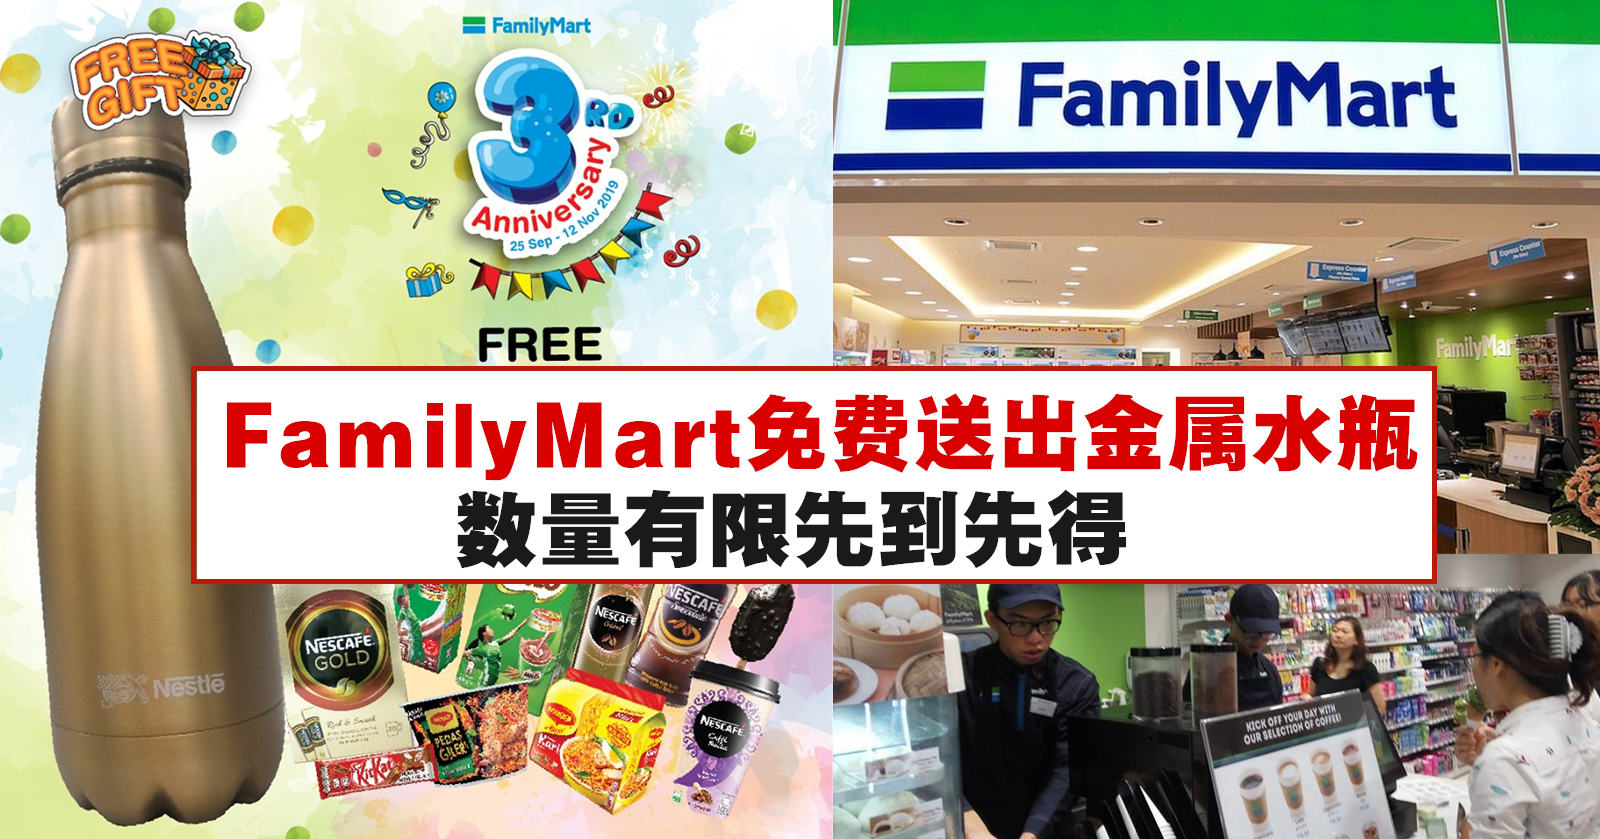 FamilyMart免费送出金属水瓶